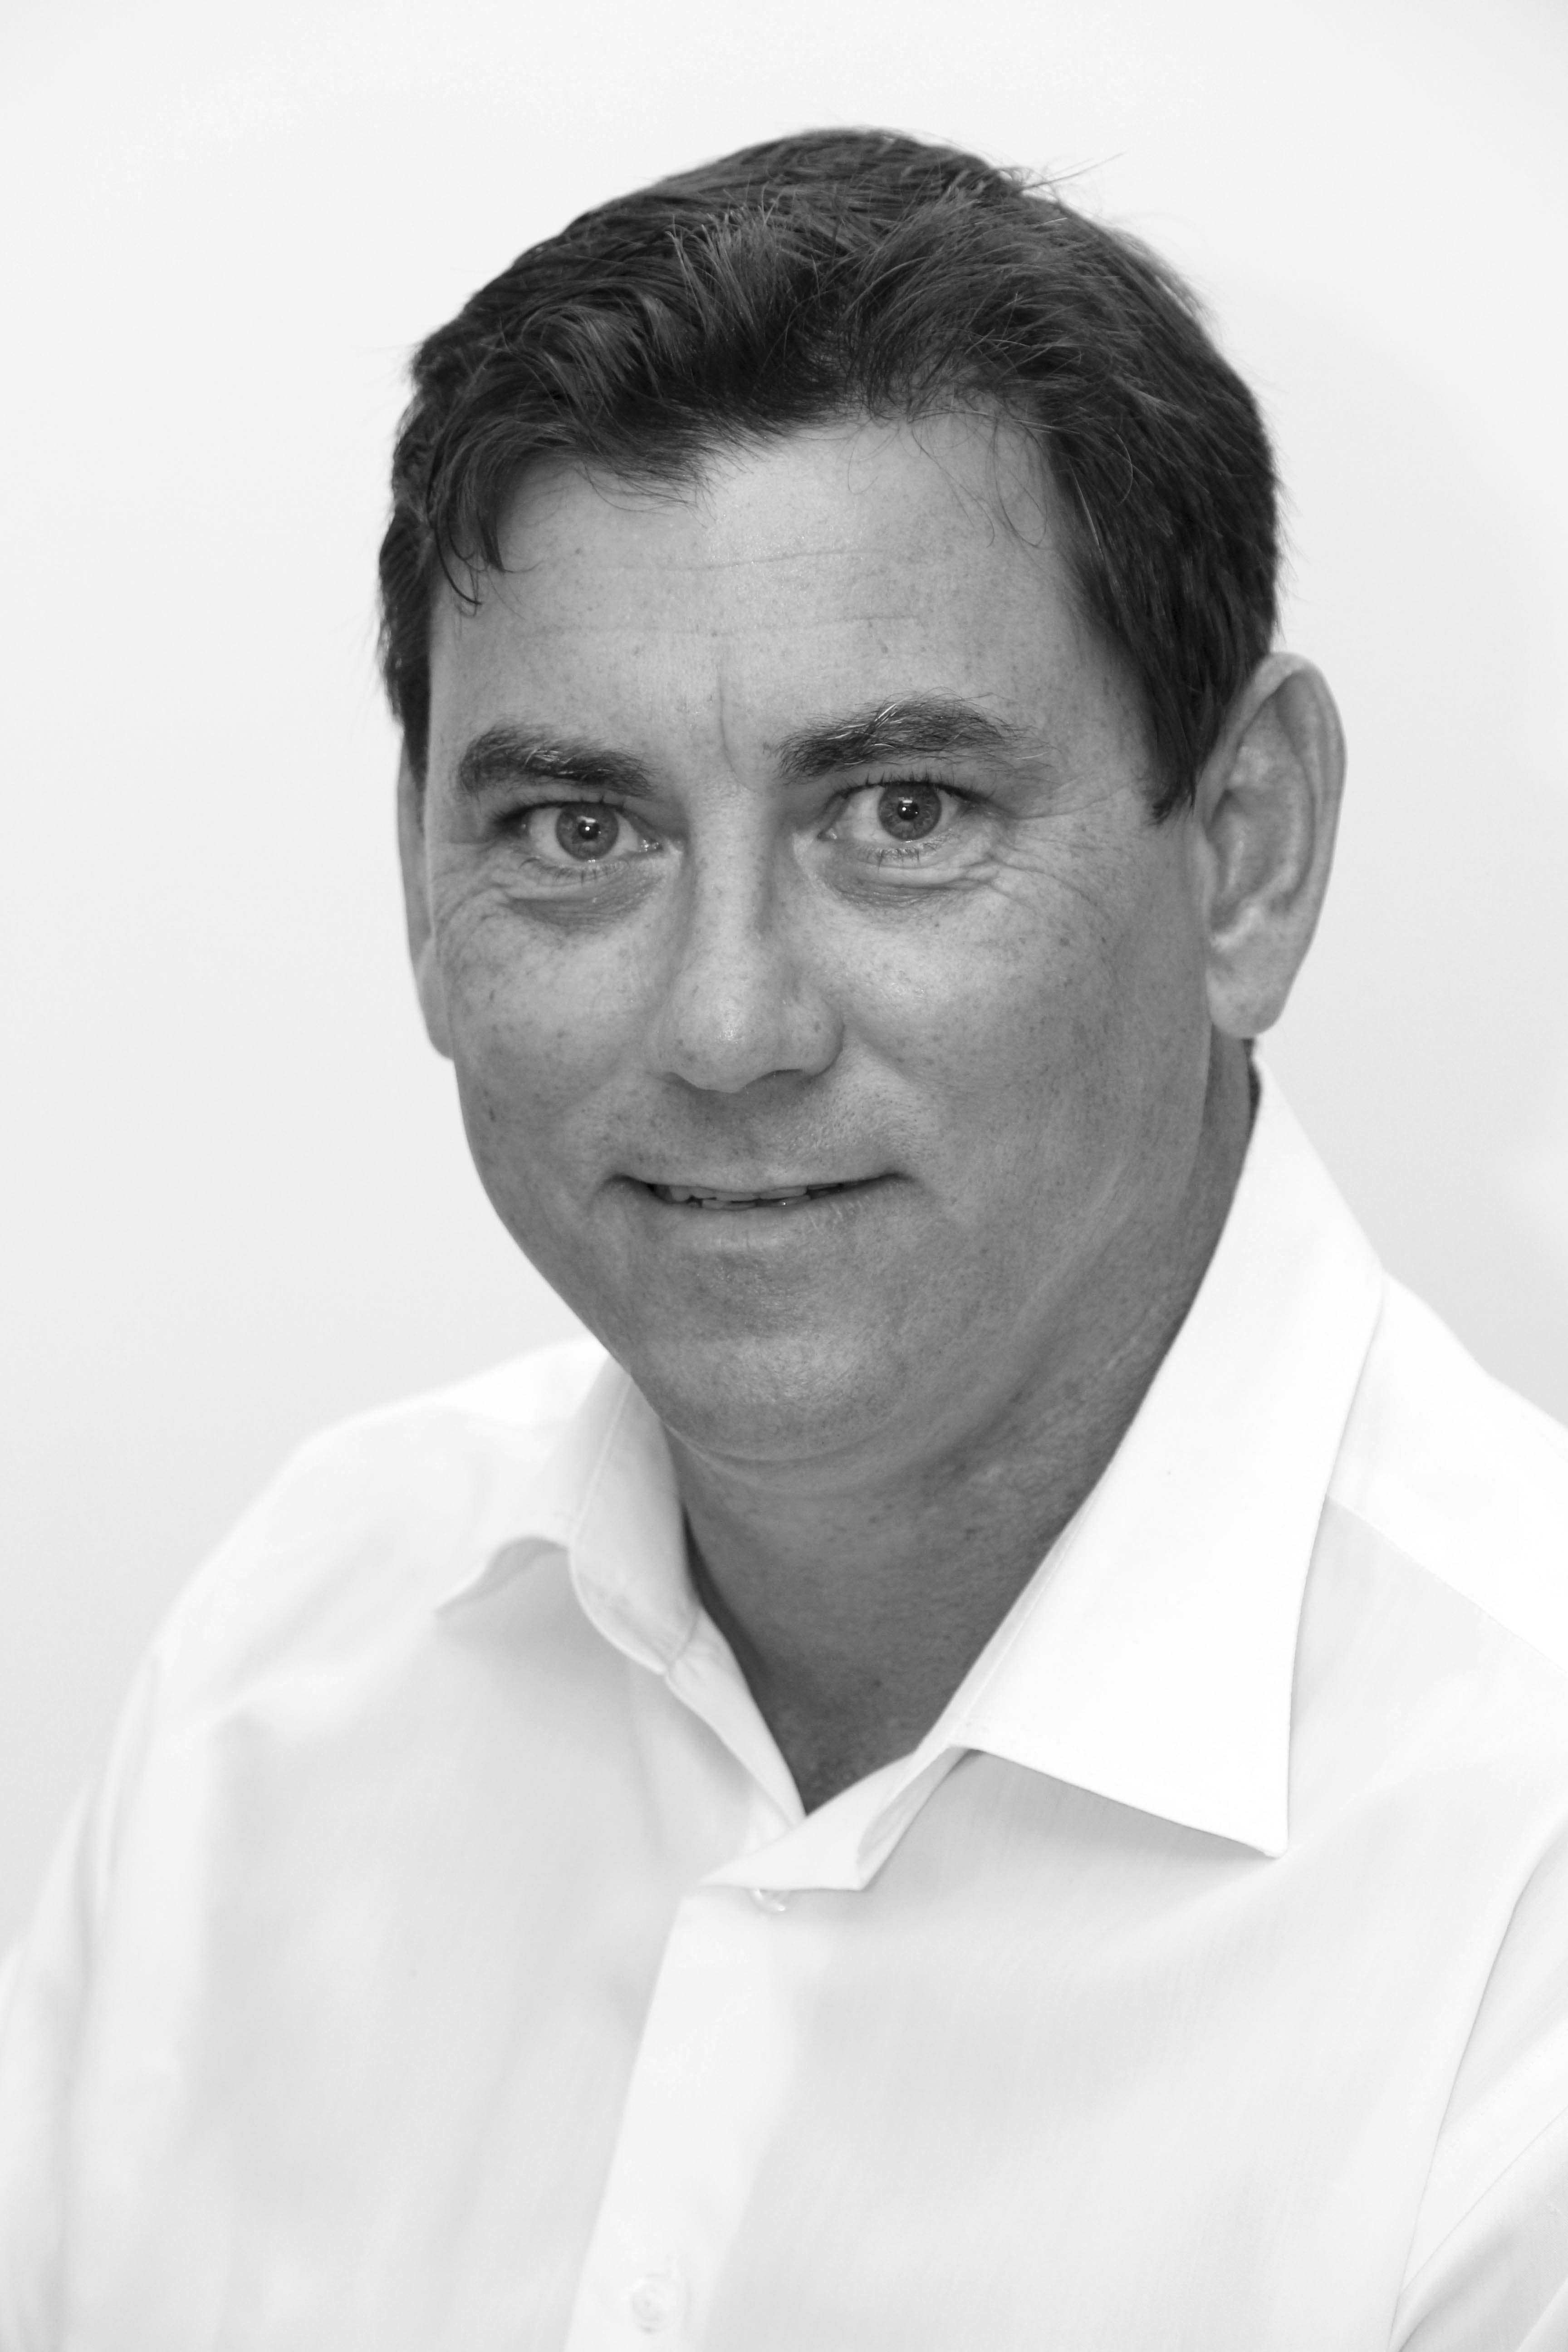 Timo Geldenhuys